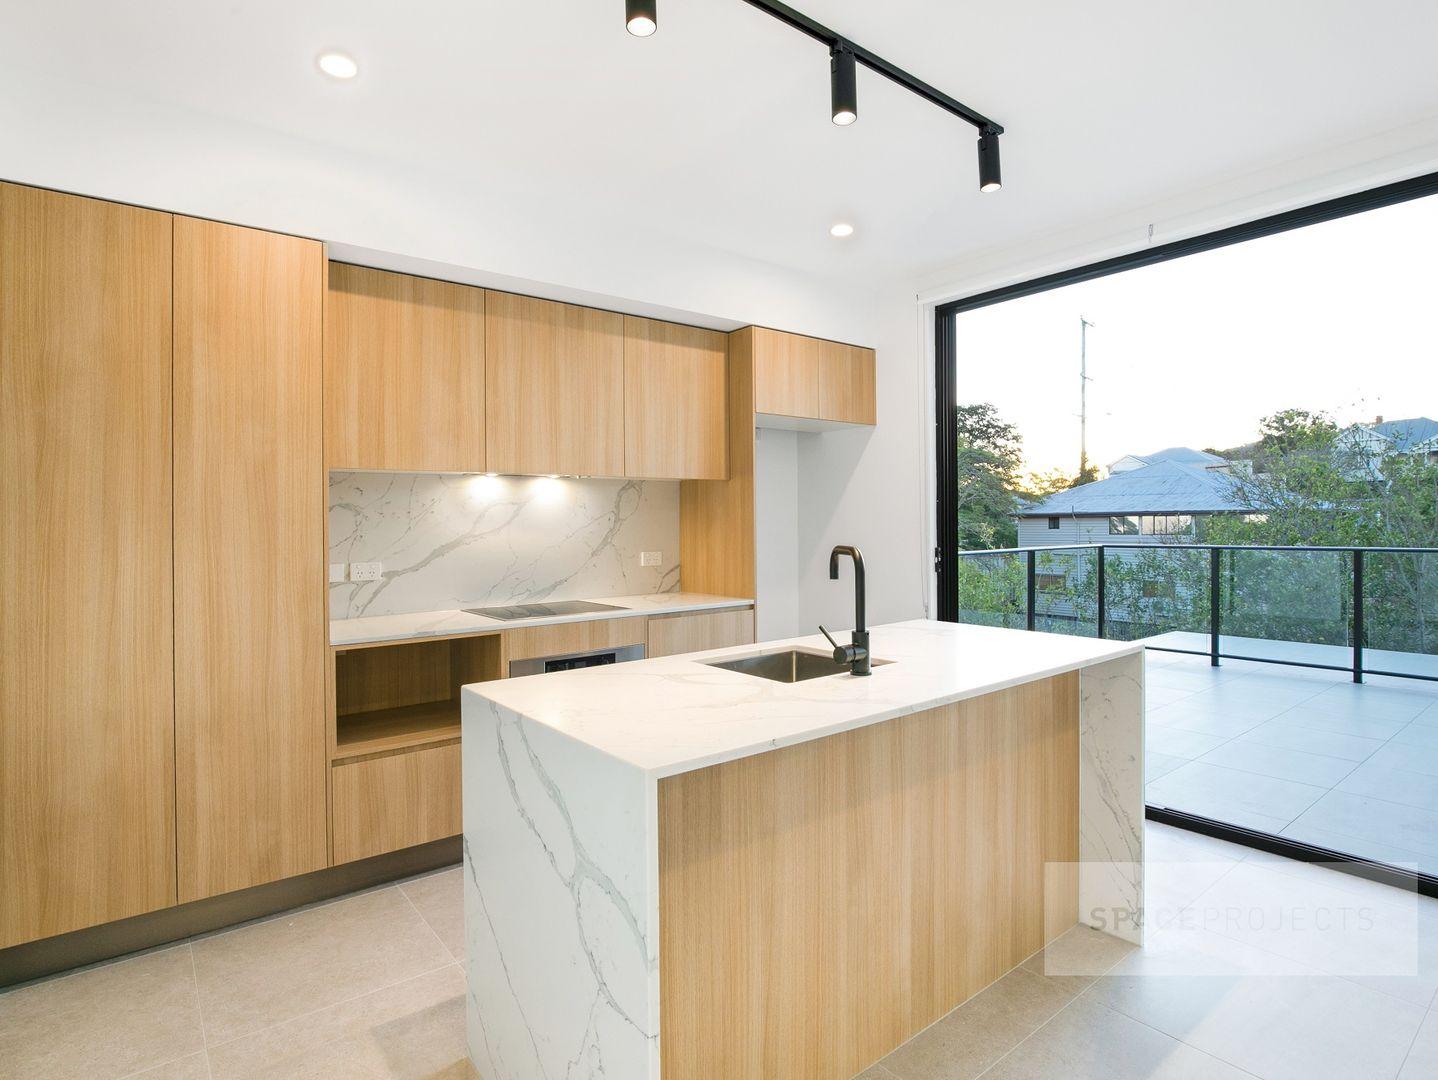 14/4 Shirley Street, Indooroopilly QLD 4068, Image 0